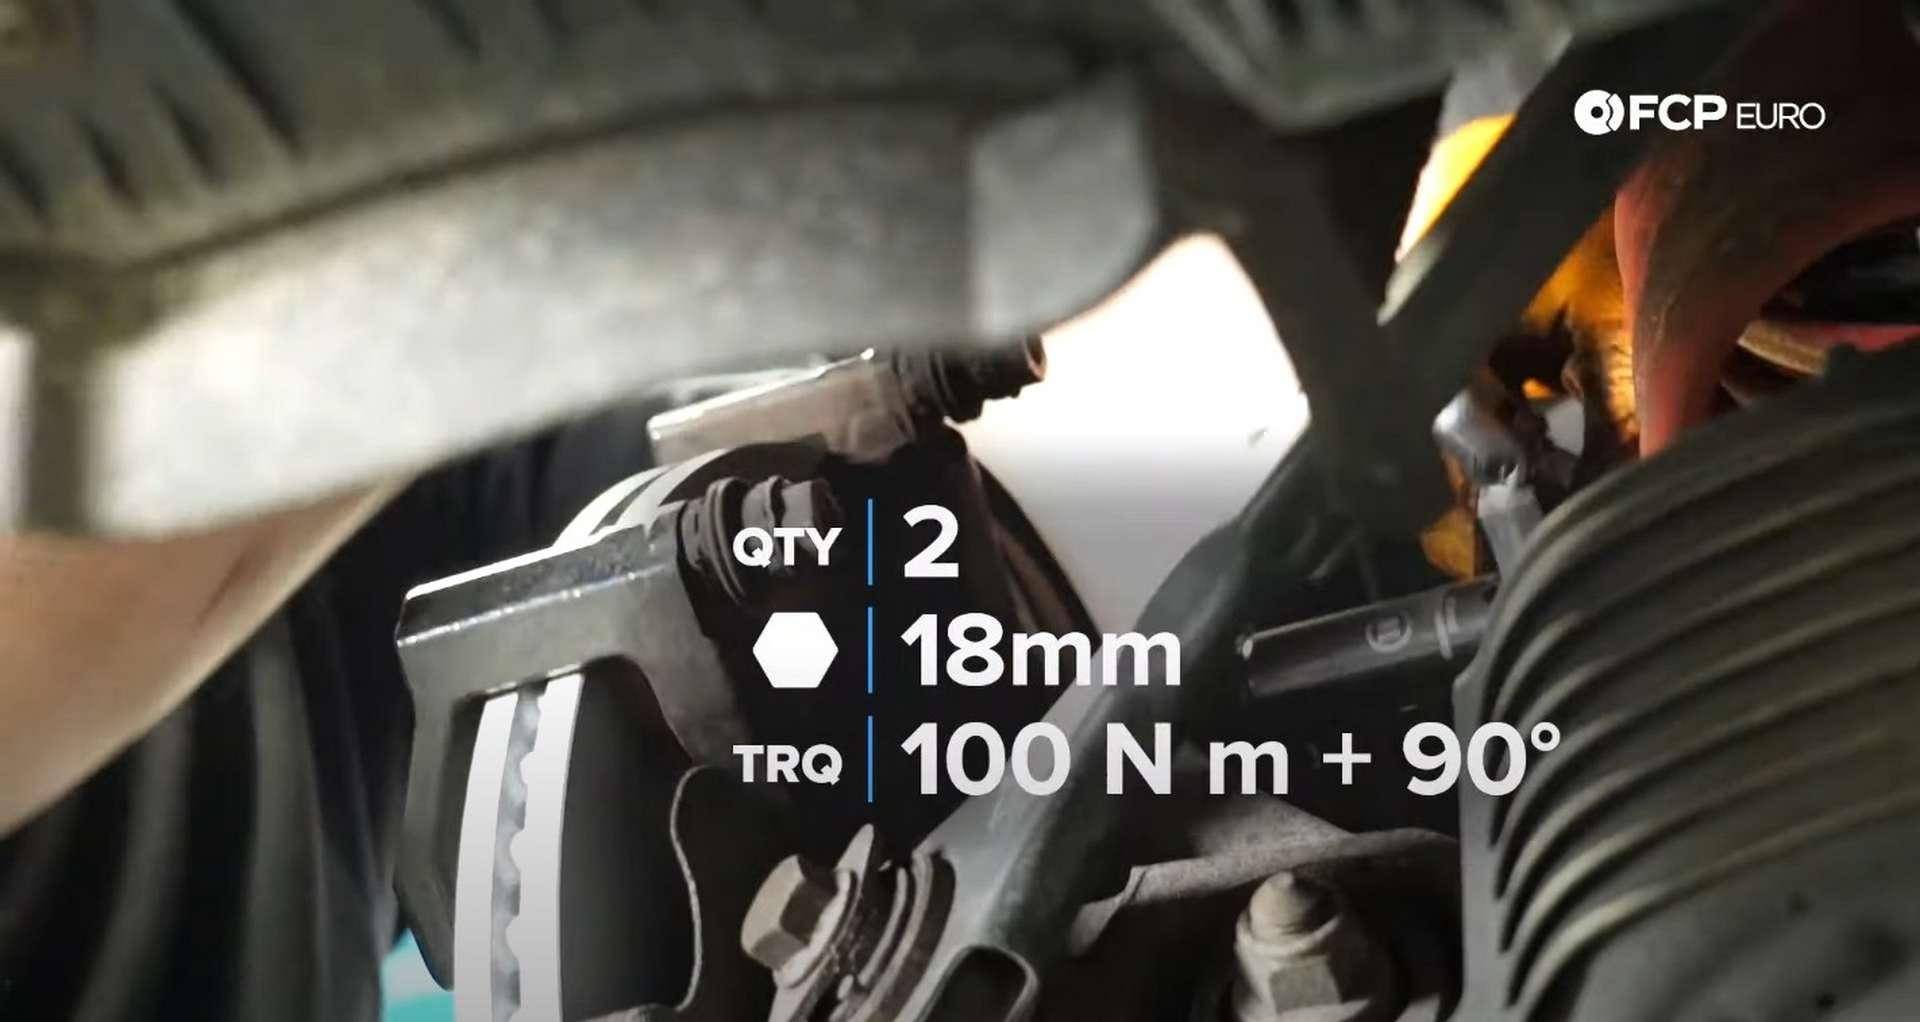 DIY Audi B8 S4 Rear Brake Service torquing the caliper bracket bolts